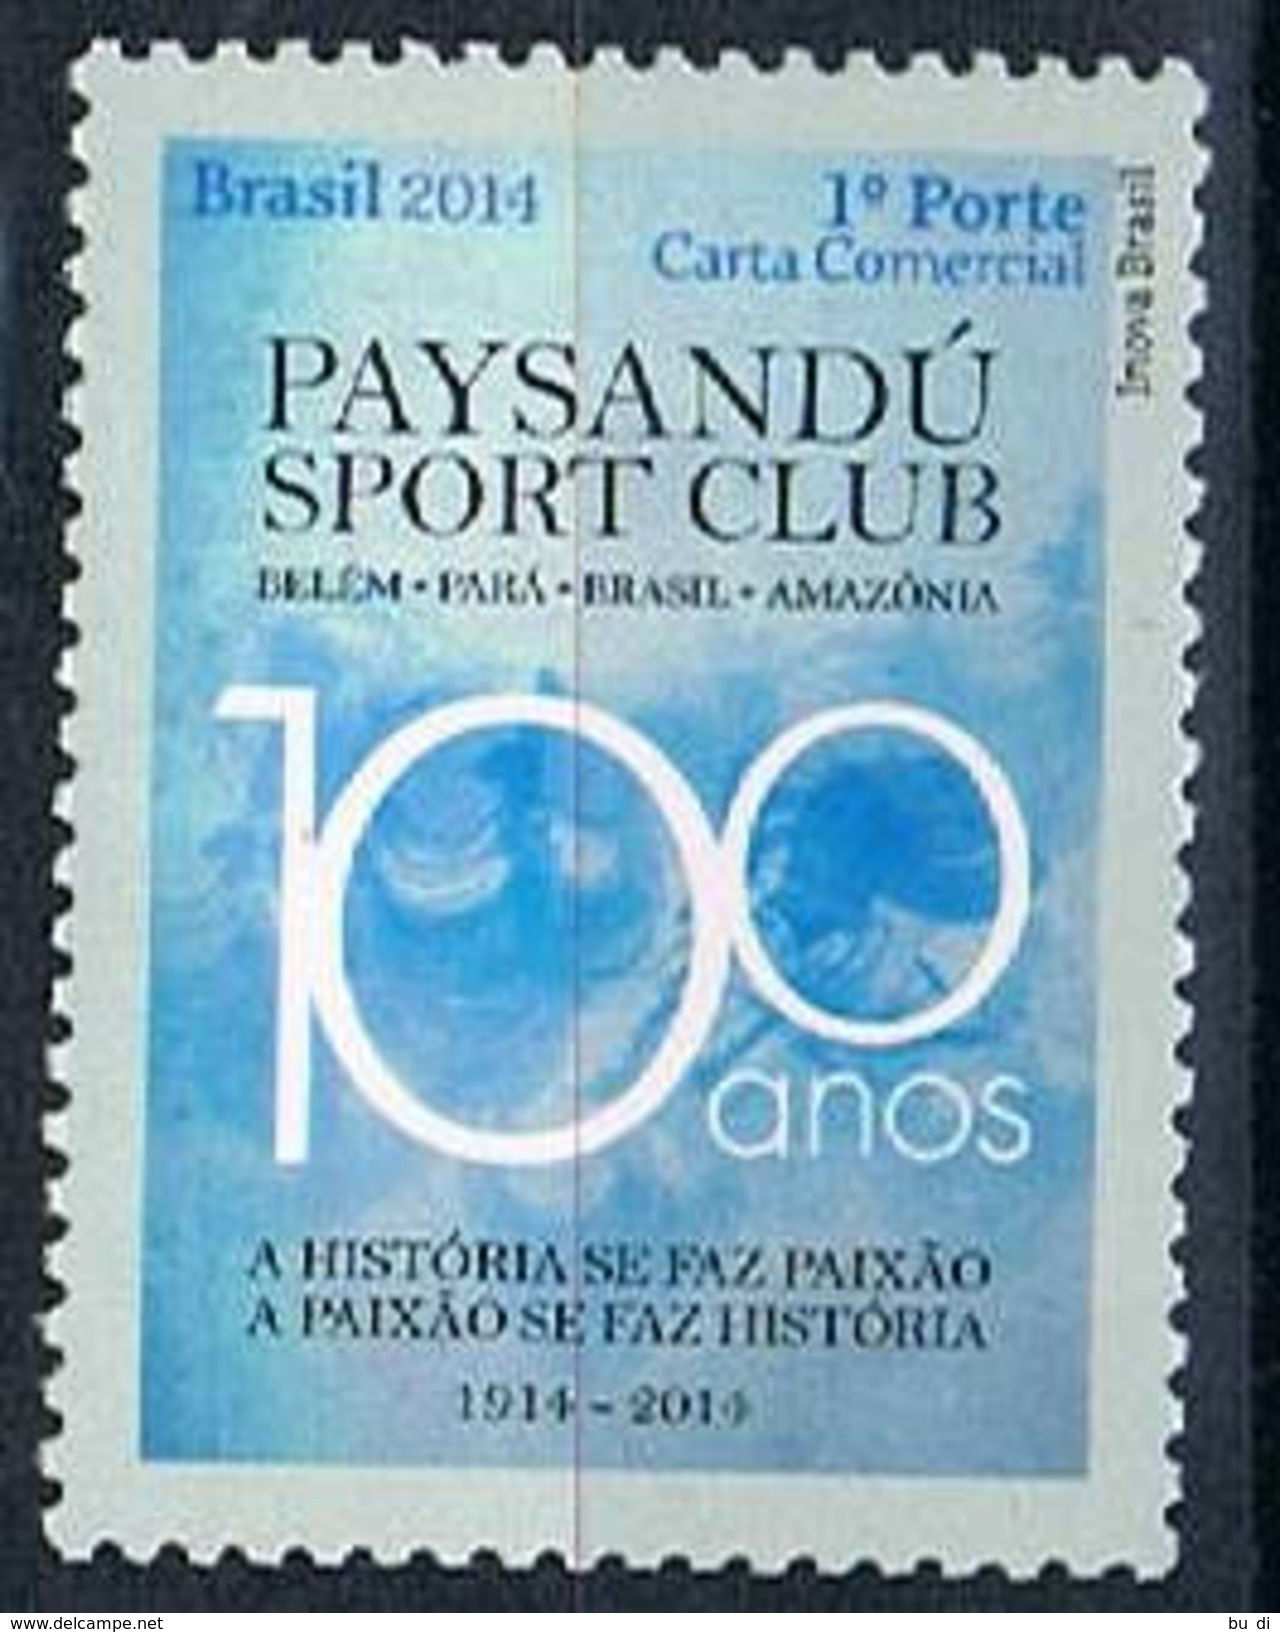 Brasilien 4139 - Paysandú Sport Club, Belém, Fußball - Unused Stamps